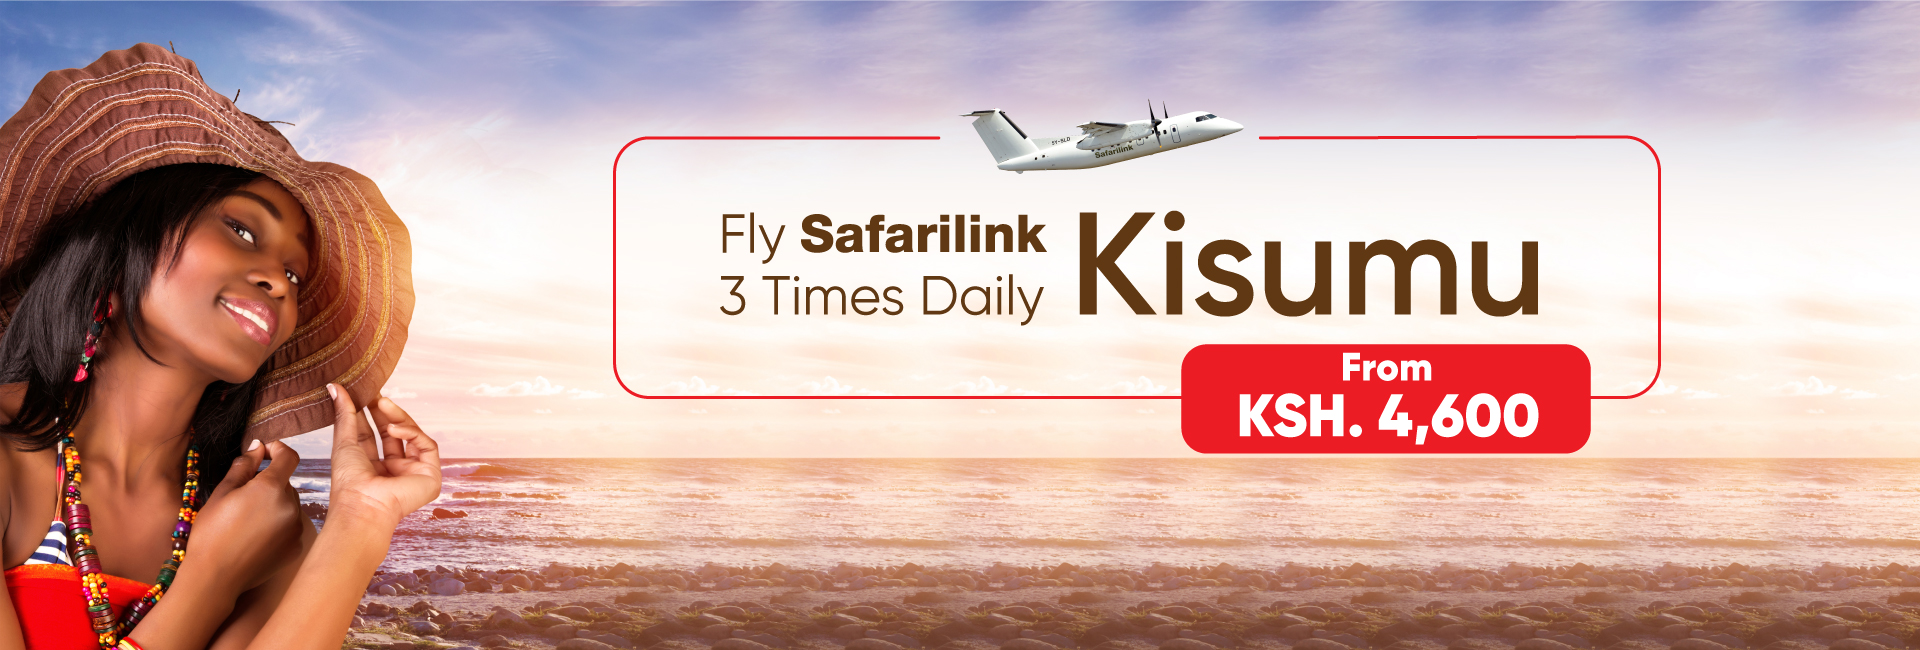 Fly Safarilink To Kisumu Website